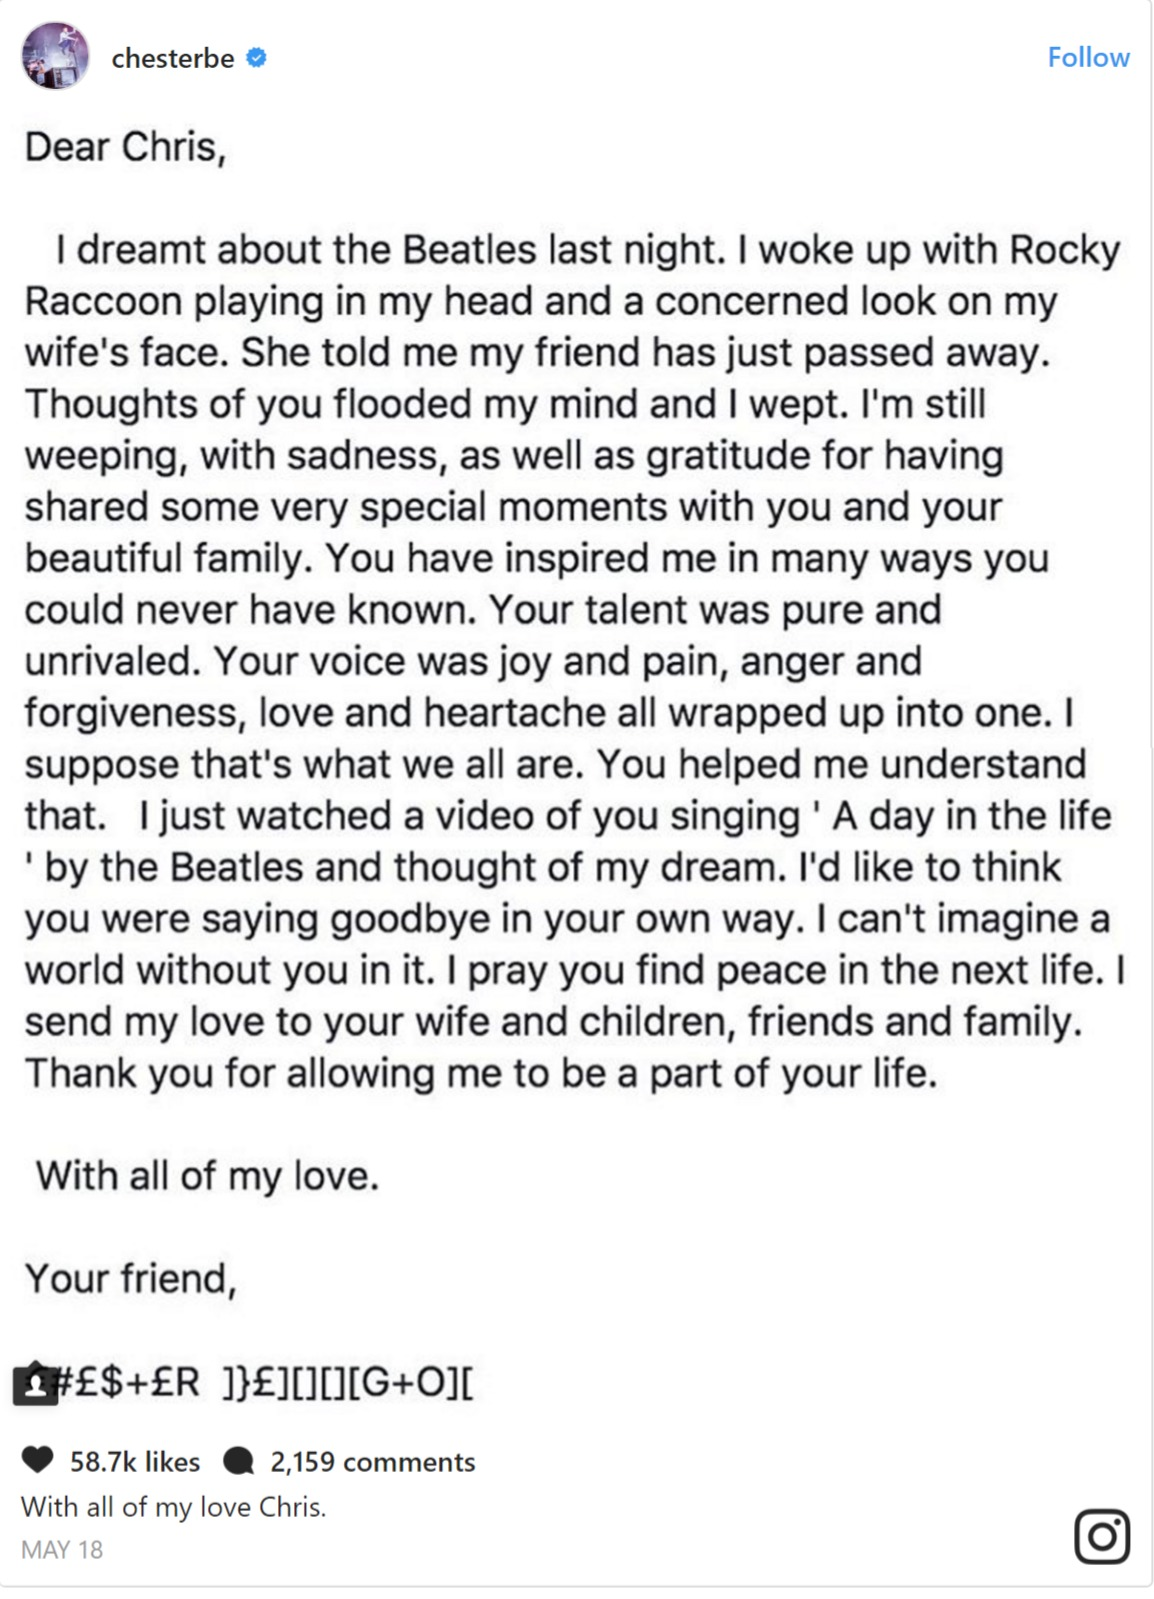 Chester Bennington's Instagram note to Chris Cornell